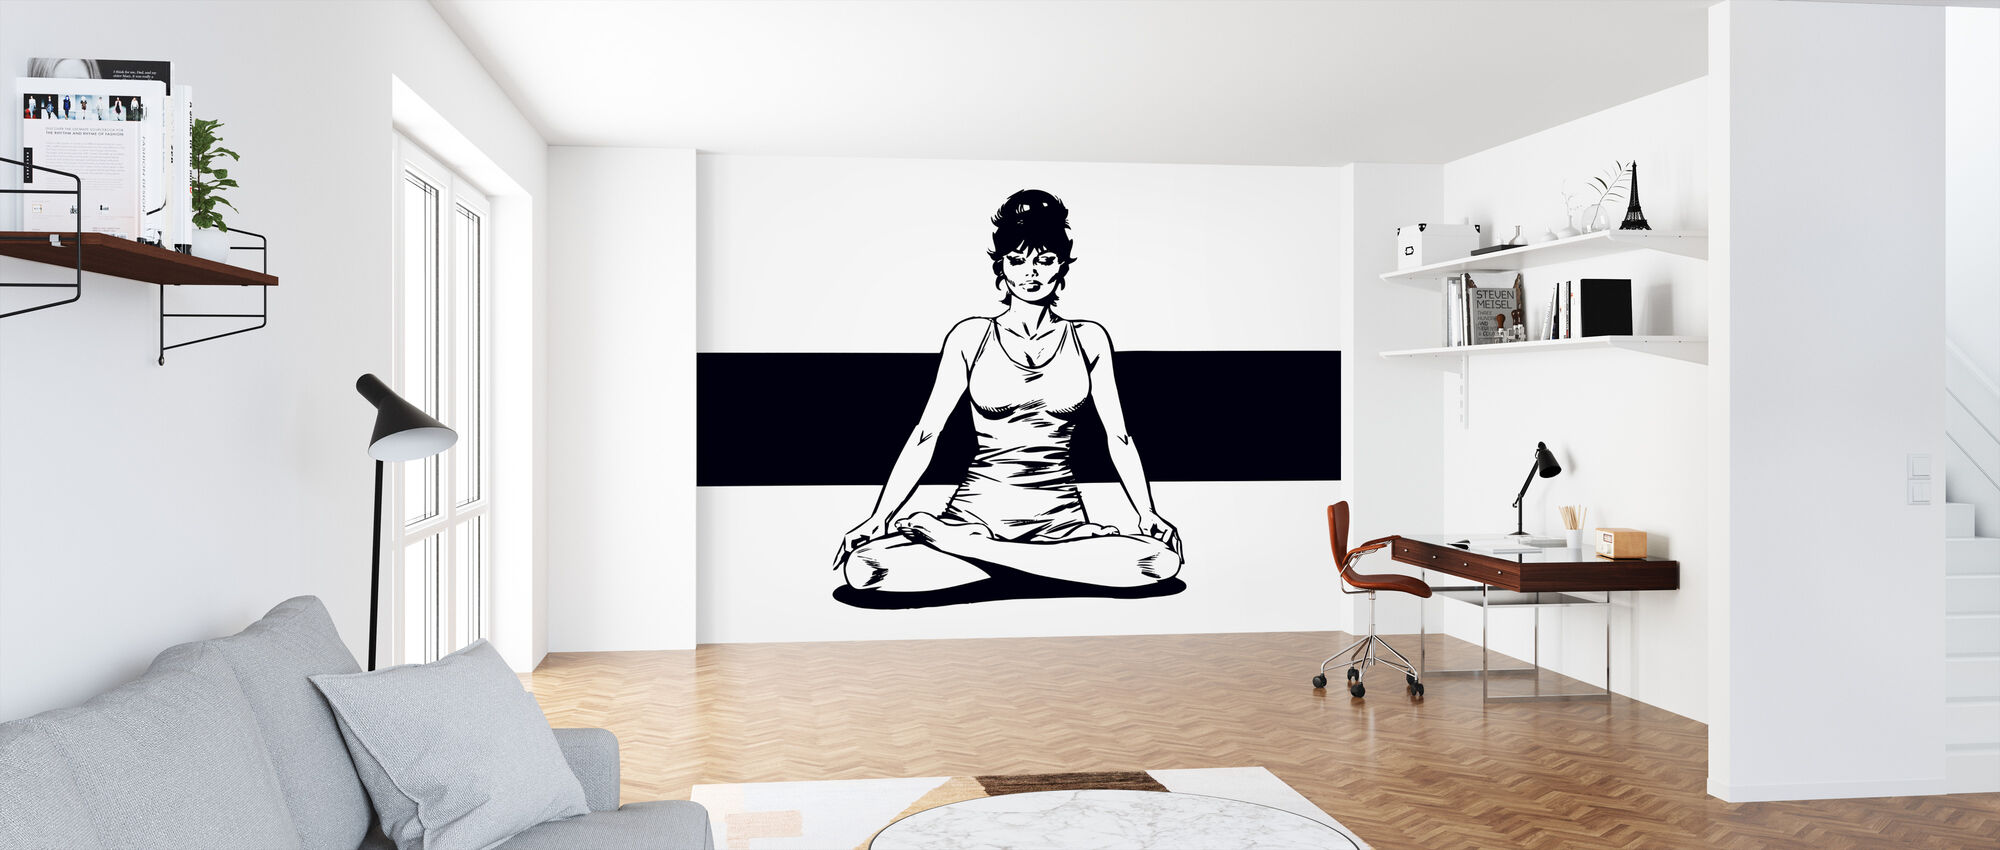 Modesty Meditates - Wallpaper - Office